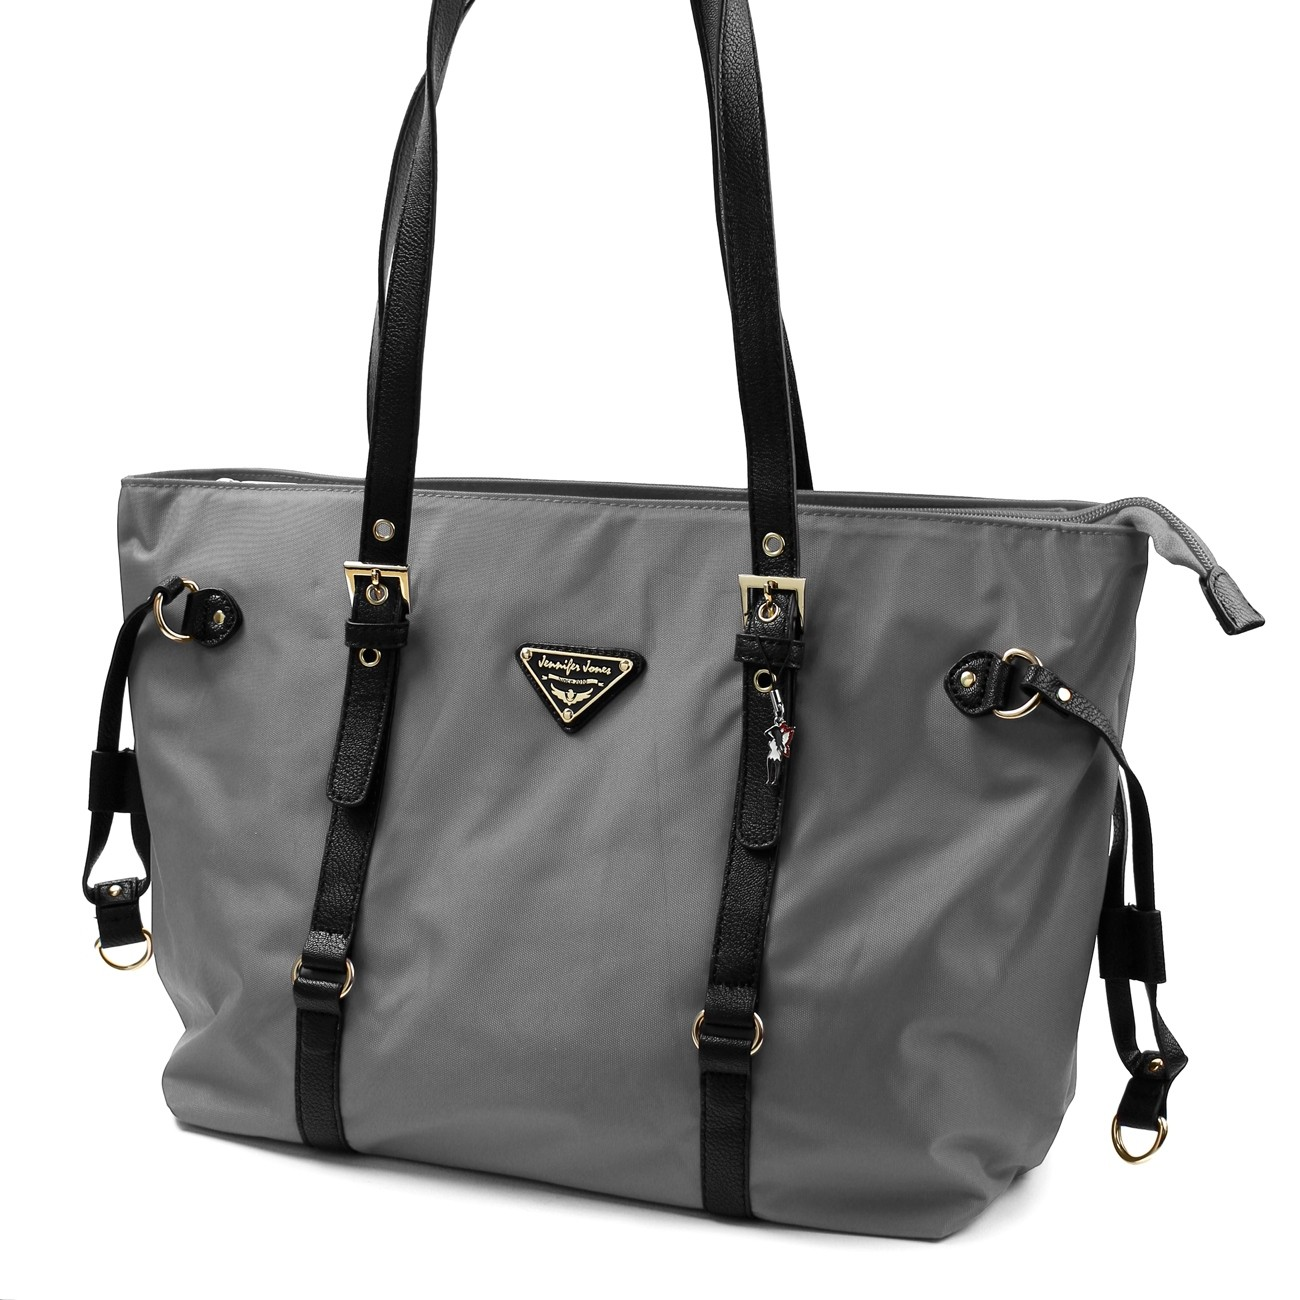 Shopper Damen Handtasche grau Nylon Schultertasche Jennifer Jones OTJ211K